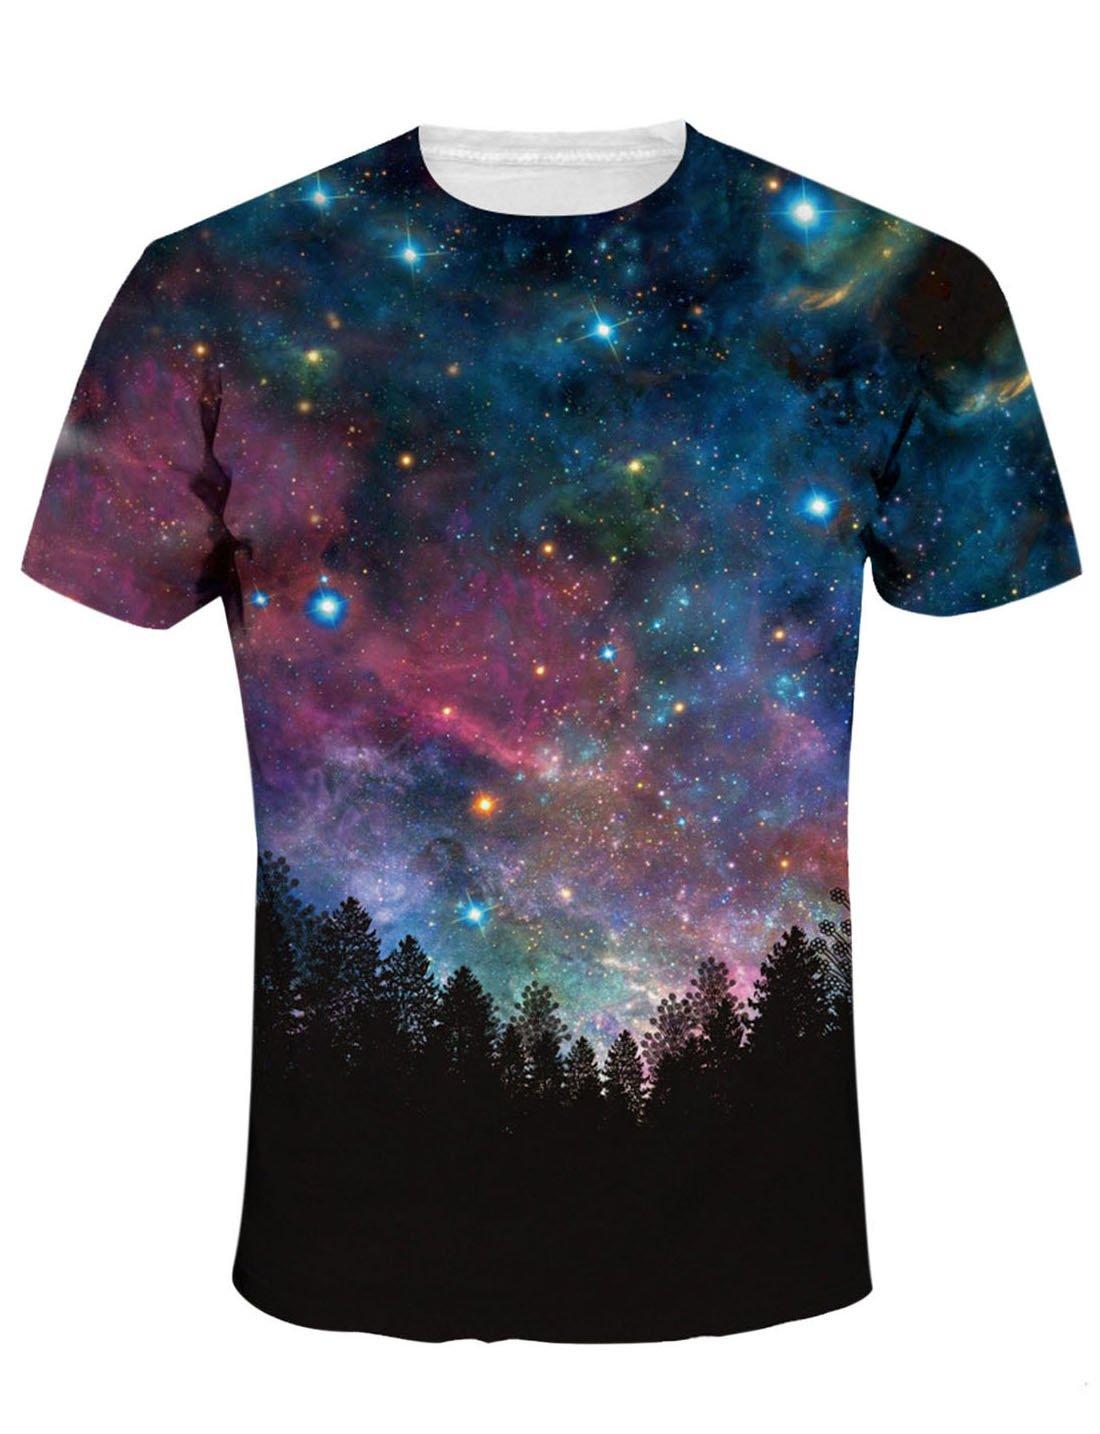 FEOYA Unisex T-Shirts Galaxy Graphic Tees Fashion Print T-Shirts Short Sleeve Shirts